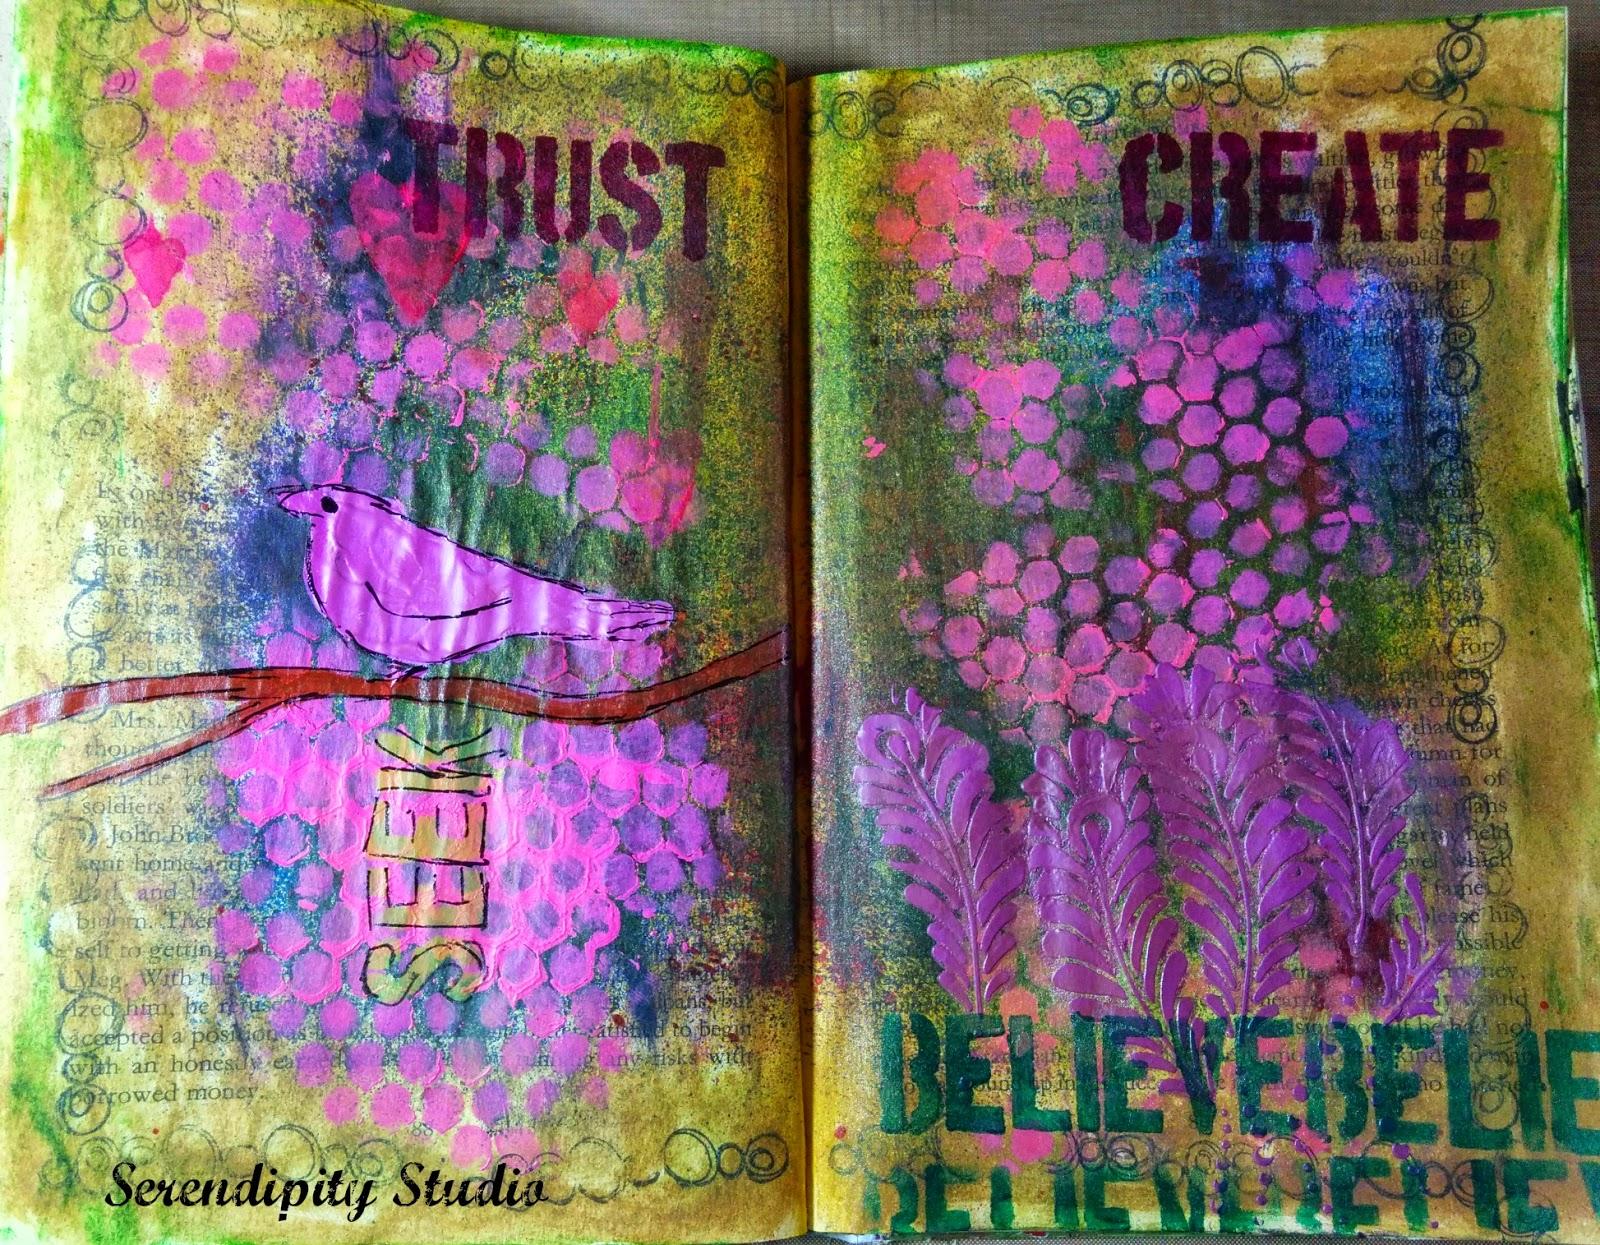 art journal journey, art journal page created by www.serendipitystudiobycw.blogspot.com , ArtistCellar stencils, DecoArt Media Line Fluid Acrylics